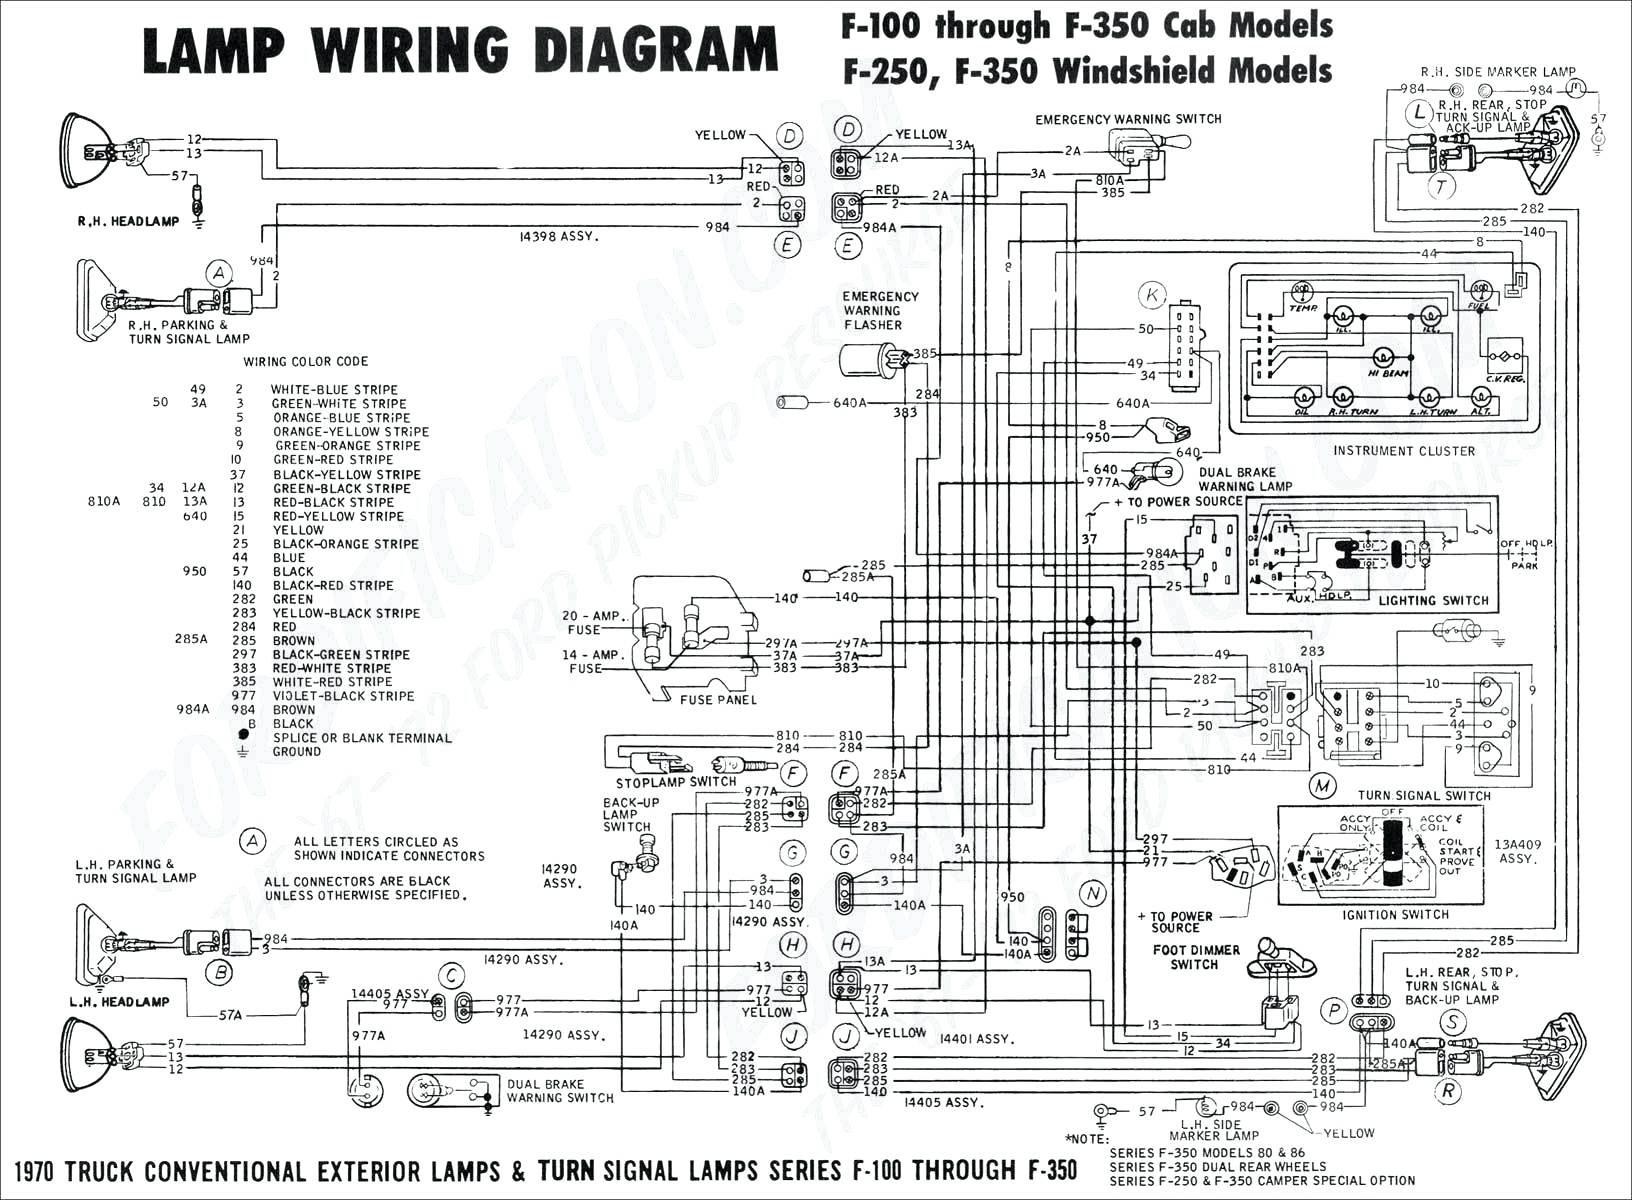 Dodge Truck Marker Light Wiring Diagram Wiring Diagram Used 2003 Dodge Caravan Wiring Diagram 2003 Ram Wiring Diagram